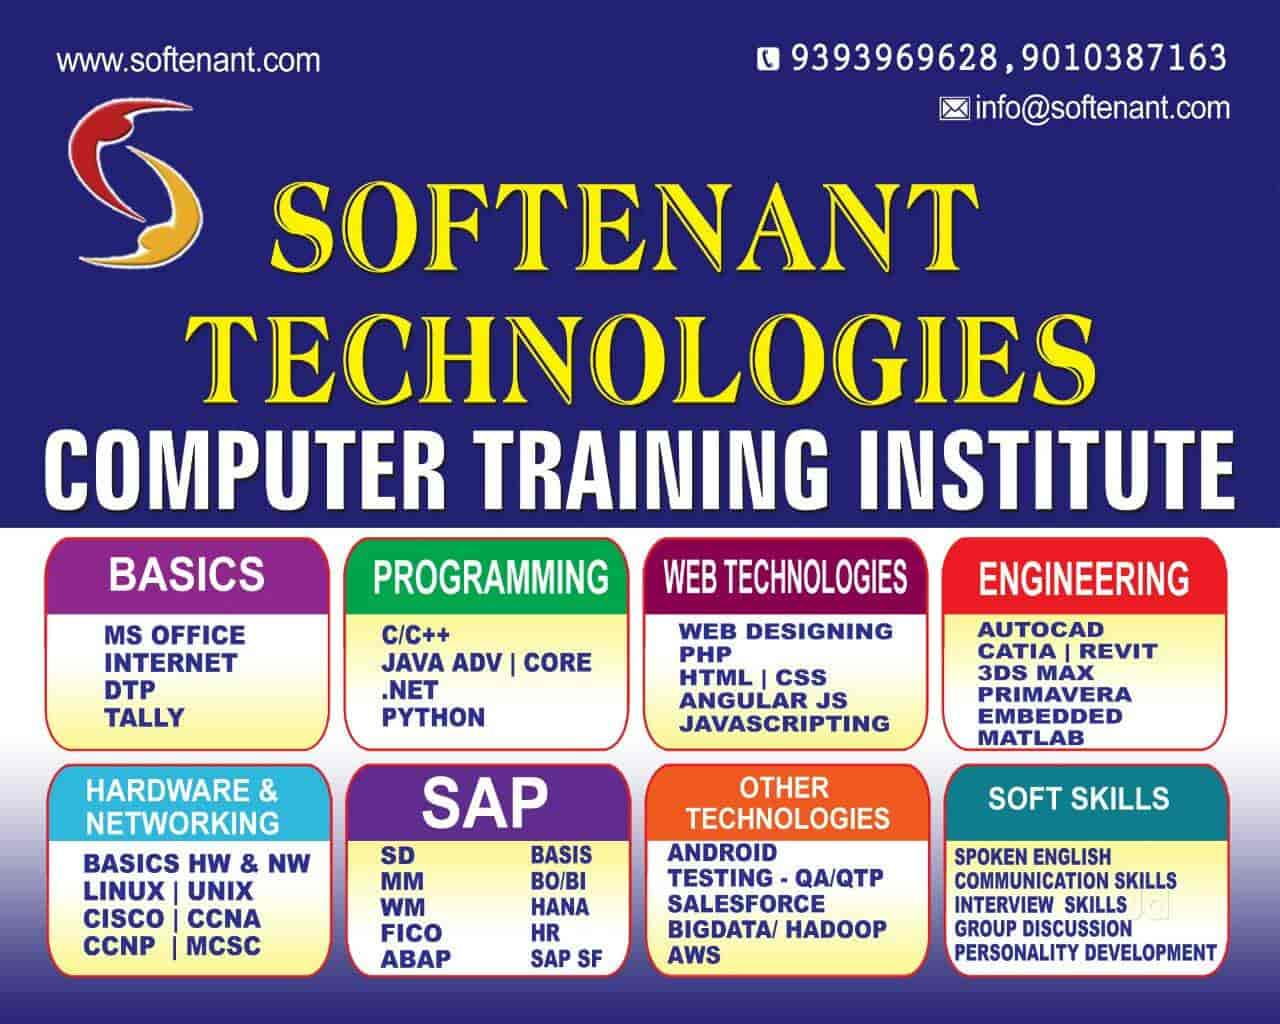 Softenant Technologies, Akkayyapalem - Computer Training